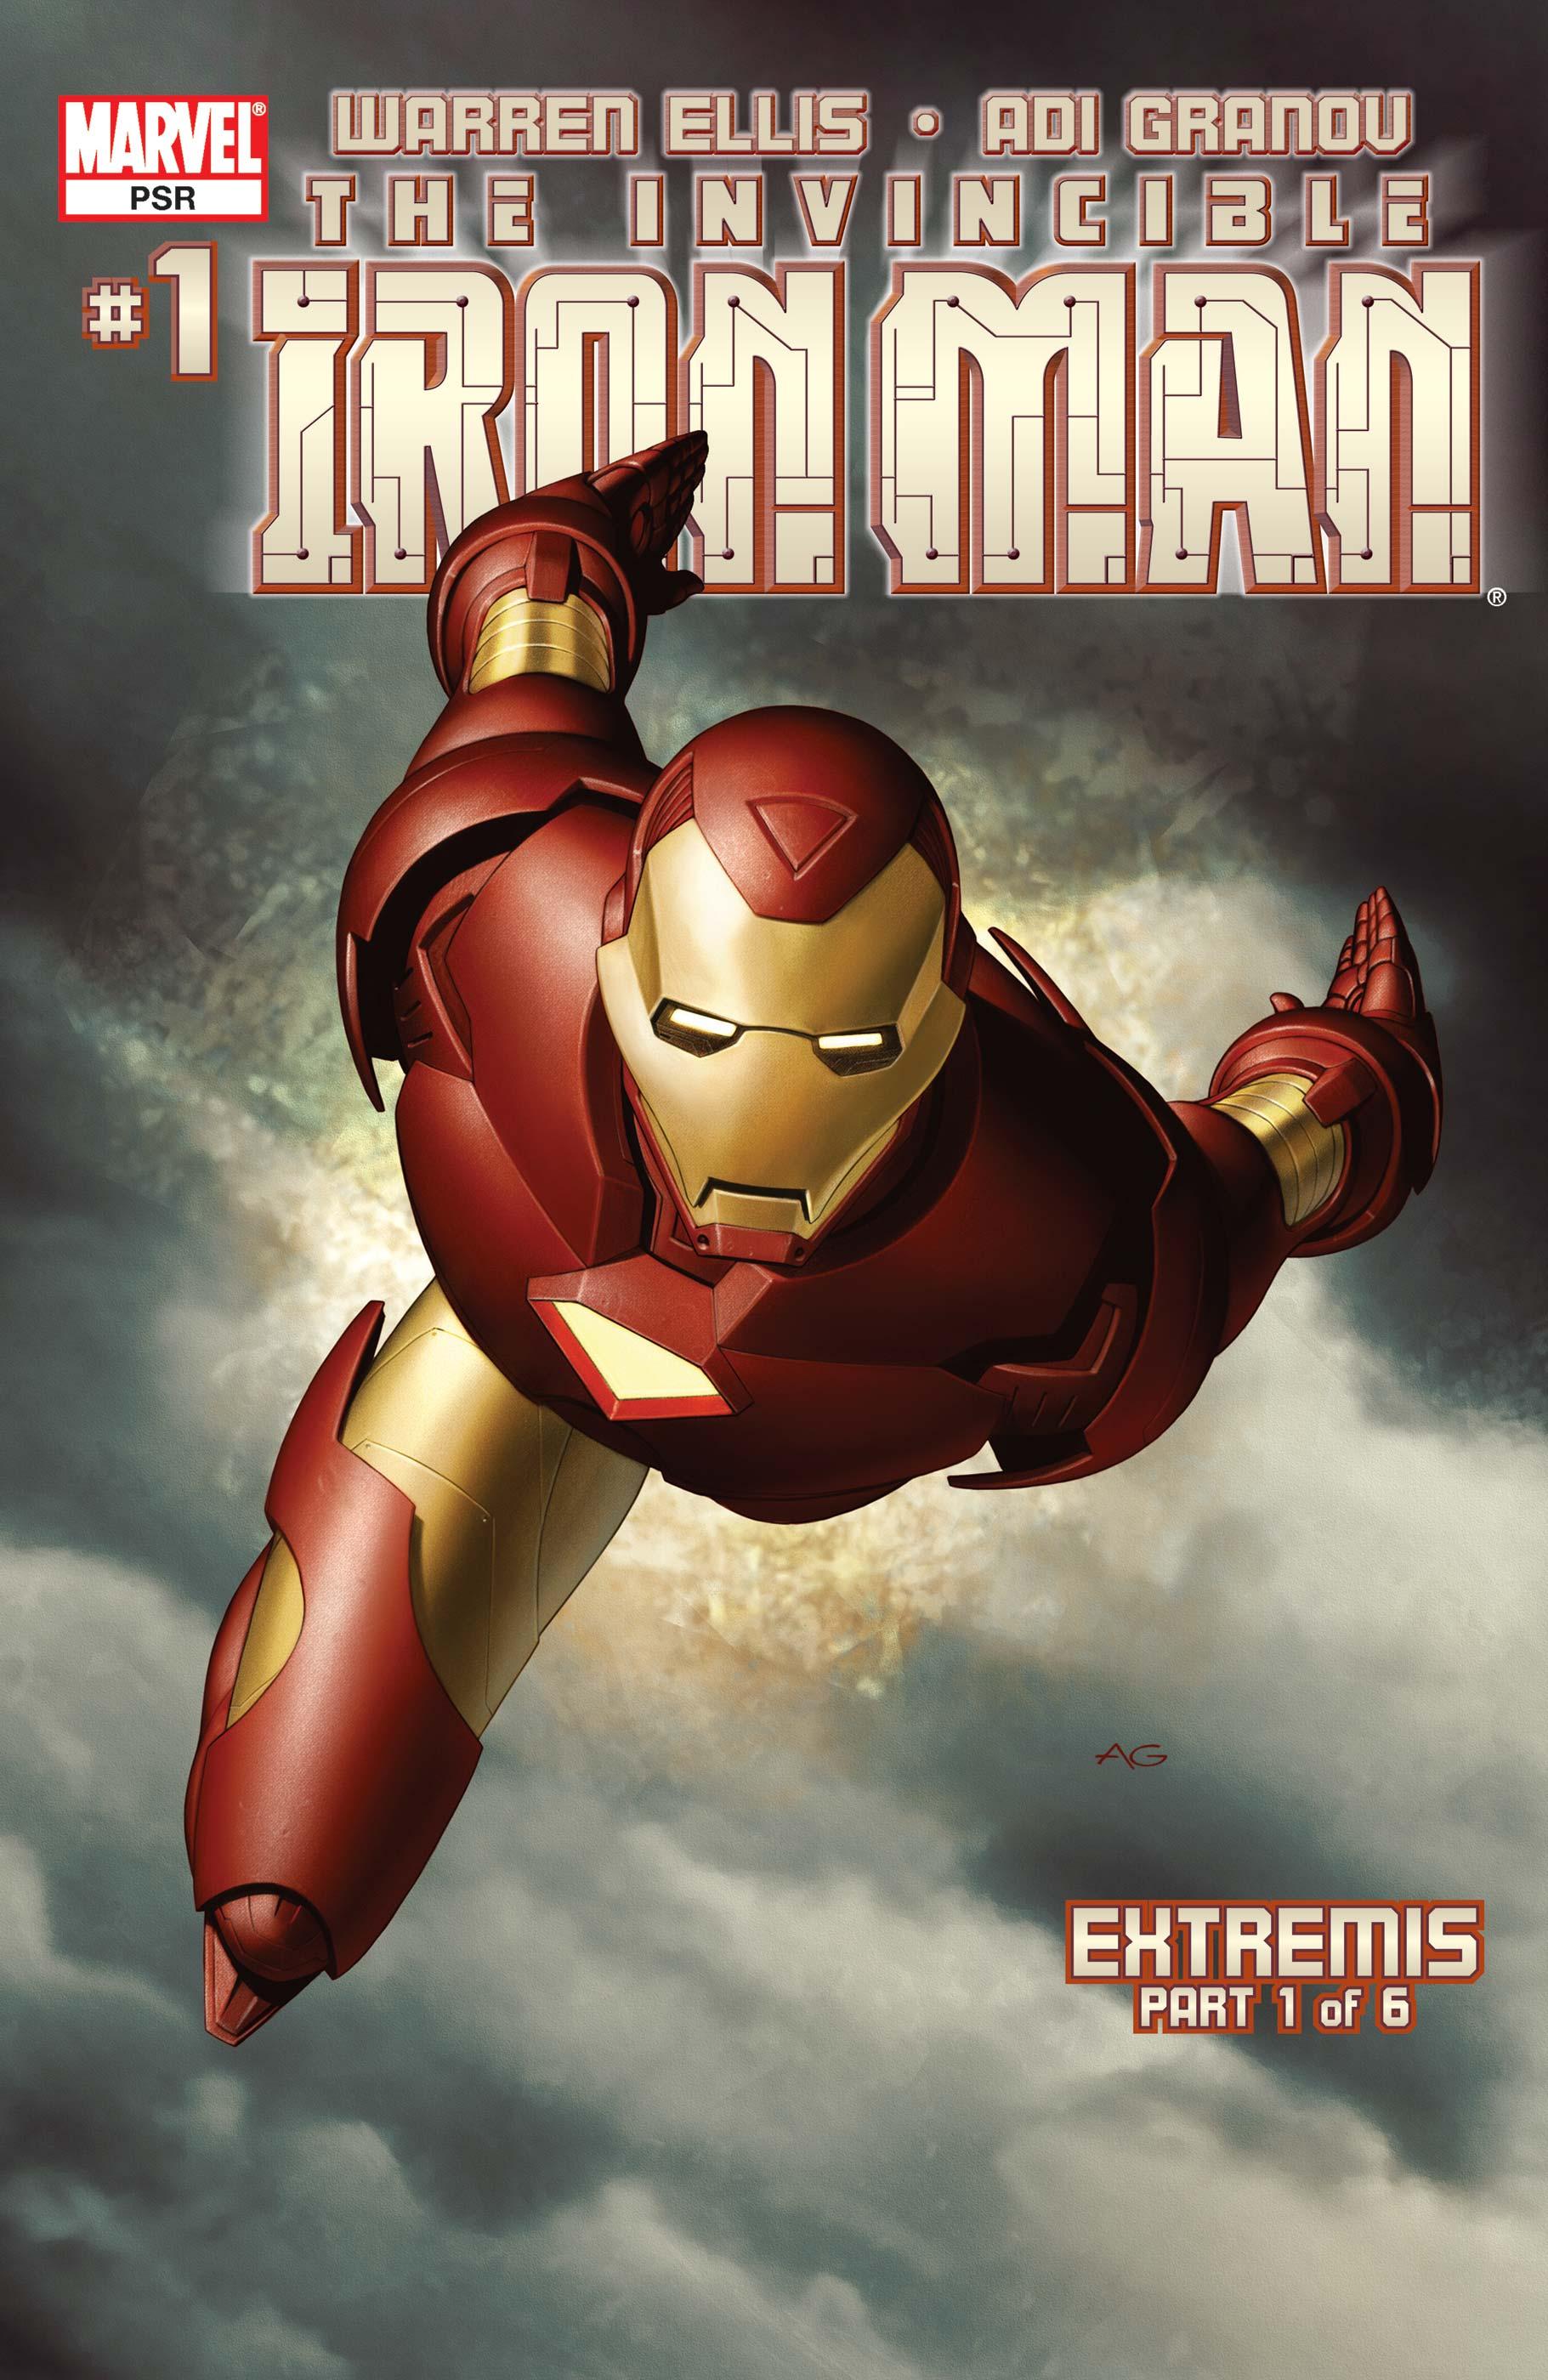 Iron man vol 4 1 marvel database fandom powered by wikia - Iron man 1 images ...